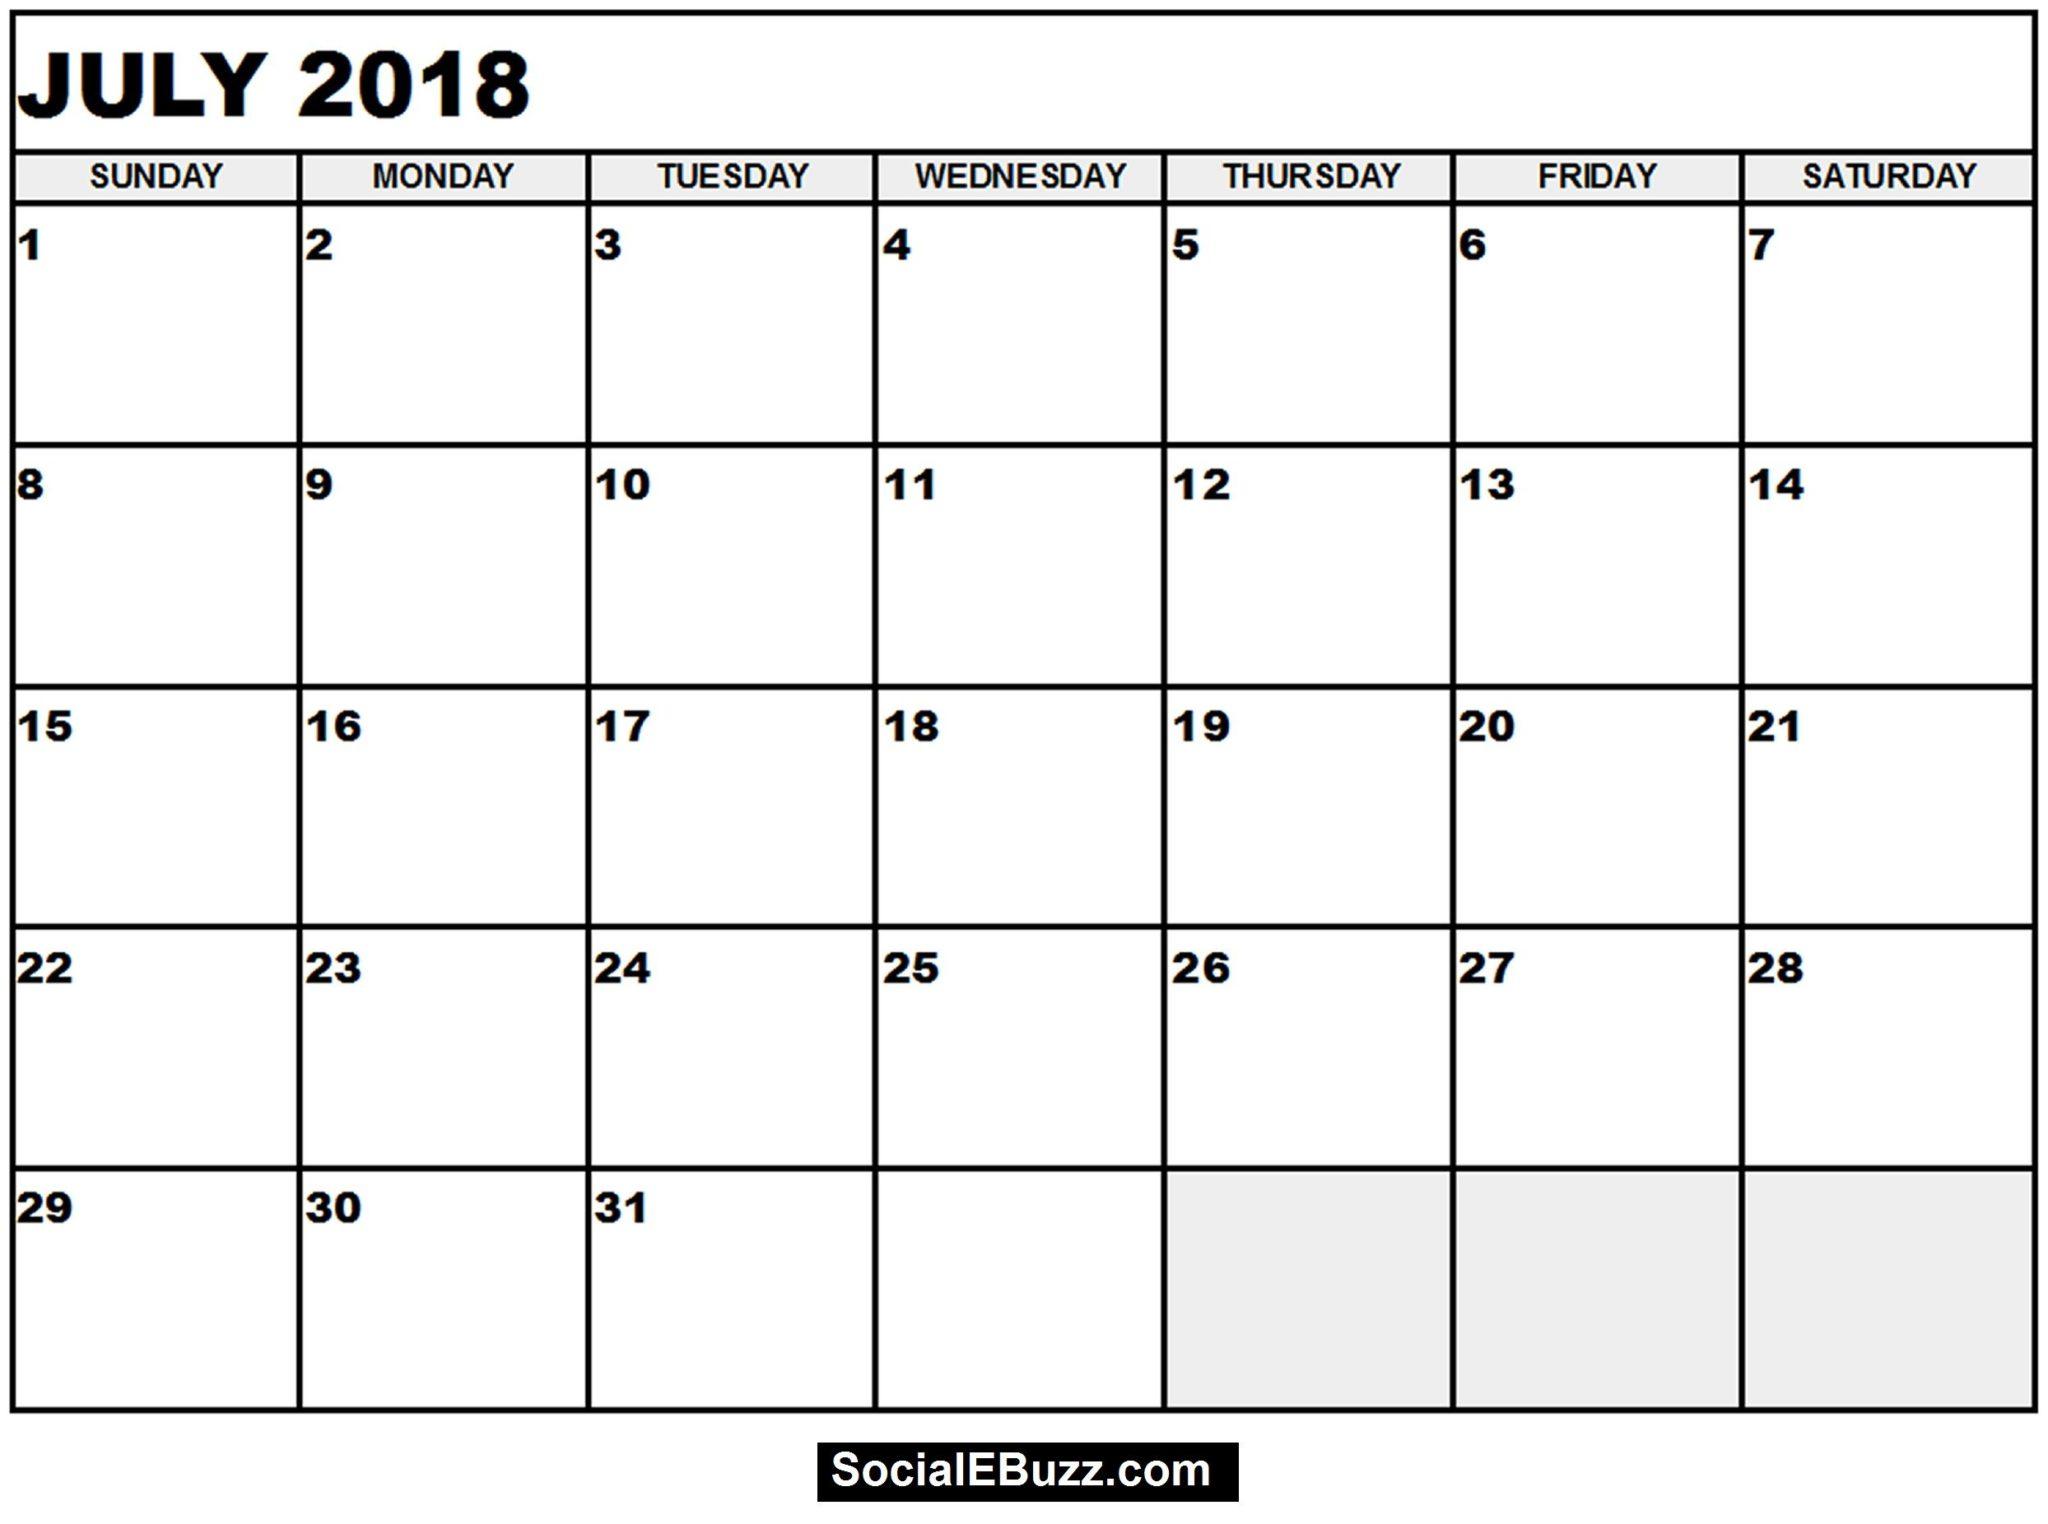 July 2018 Calendar Template Word, Pdf, Excel Format - Free June 2019 within Blank July Calendar Printable